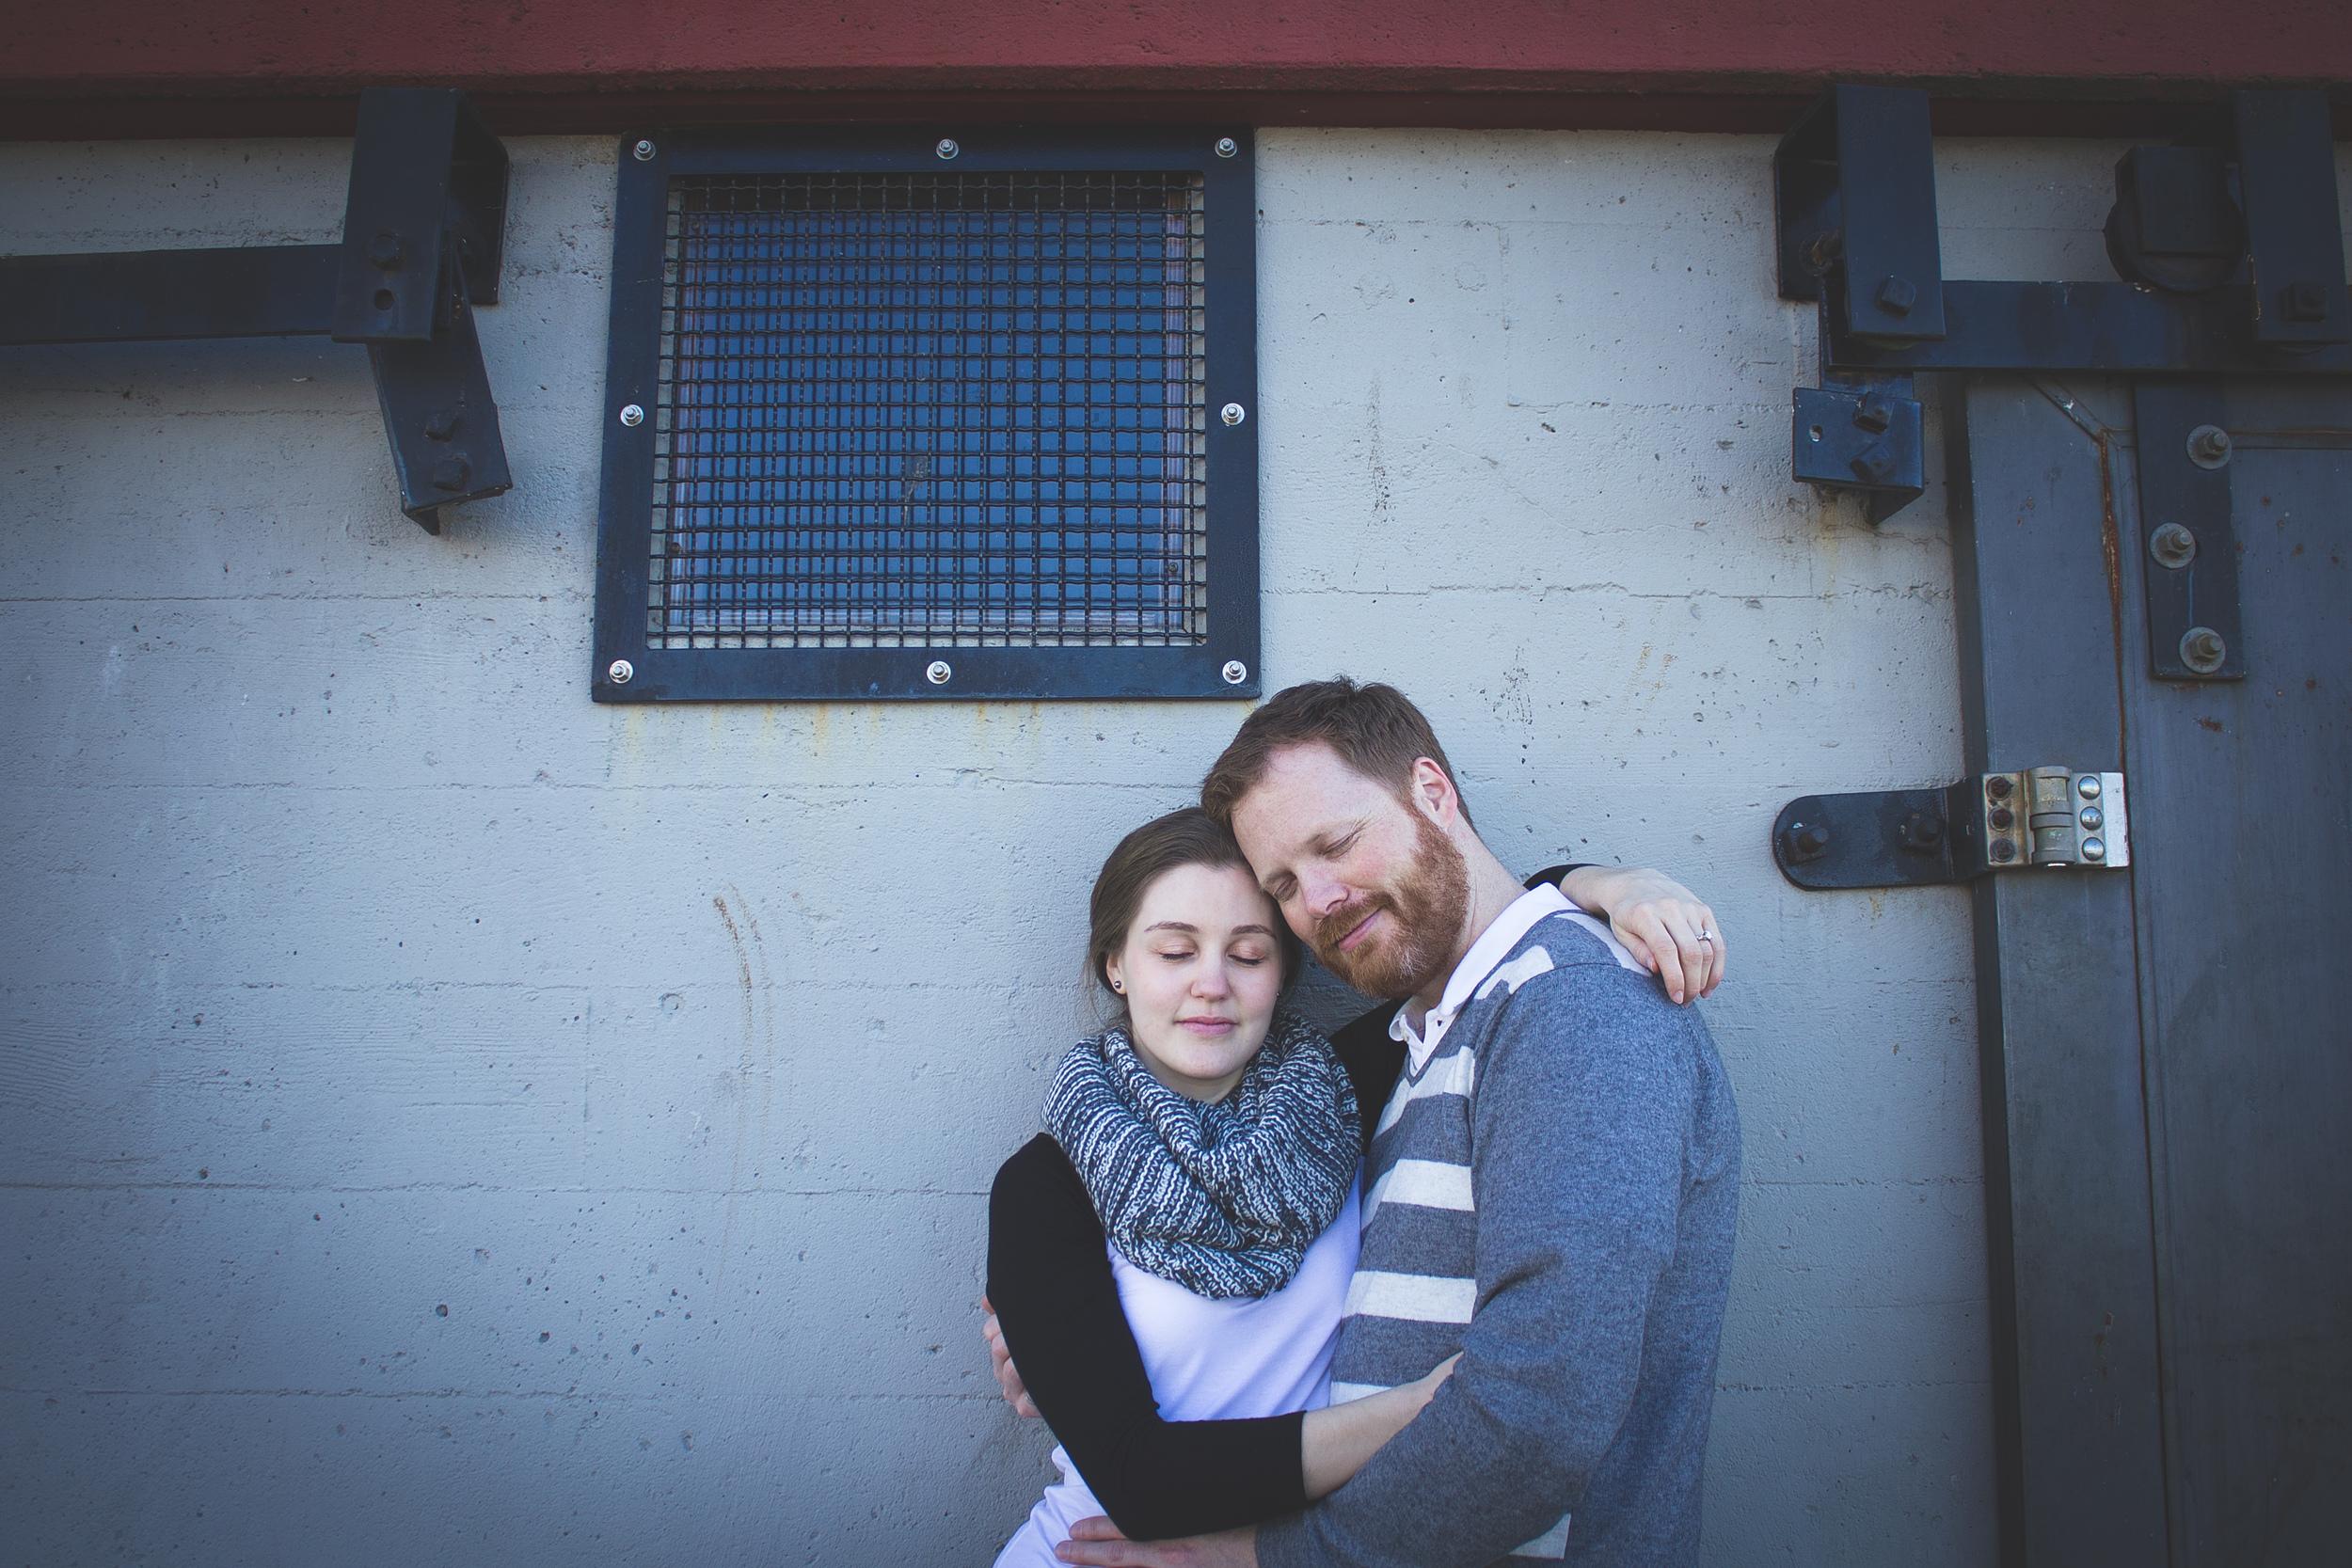 vancouver_photographer_couple_engagement_rk-26.jpg